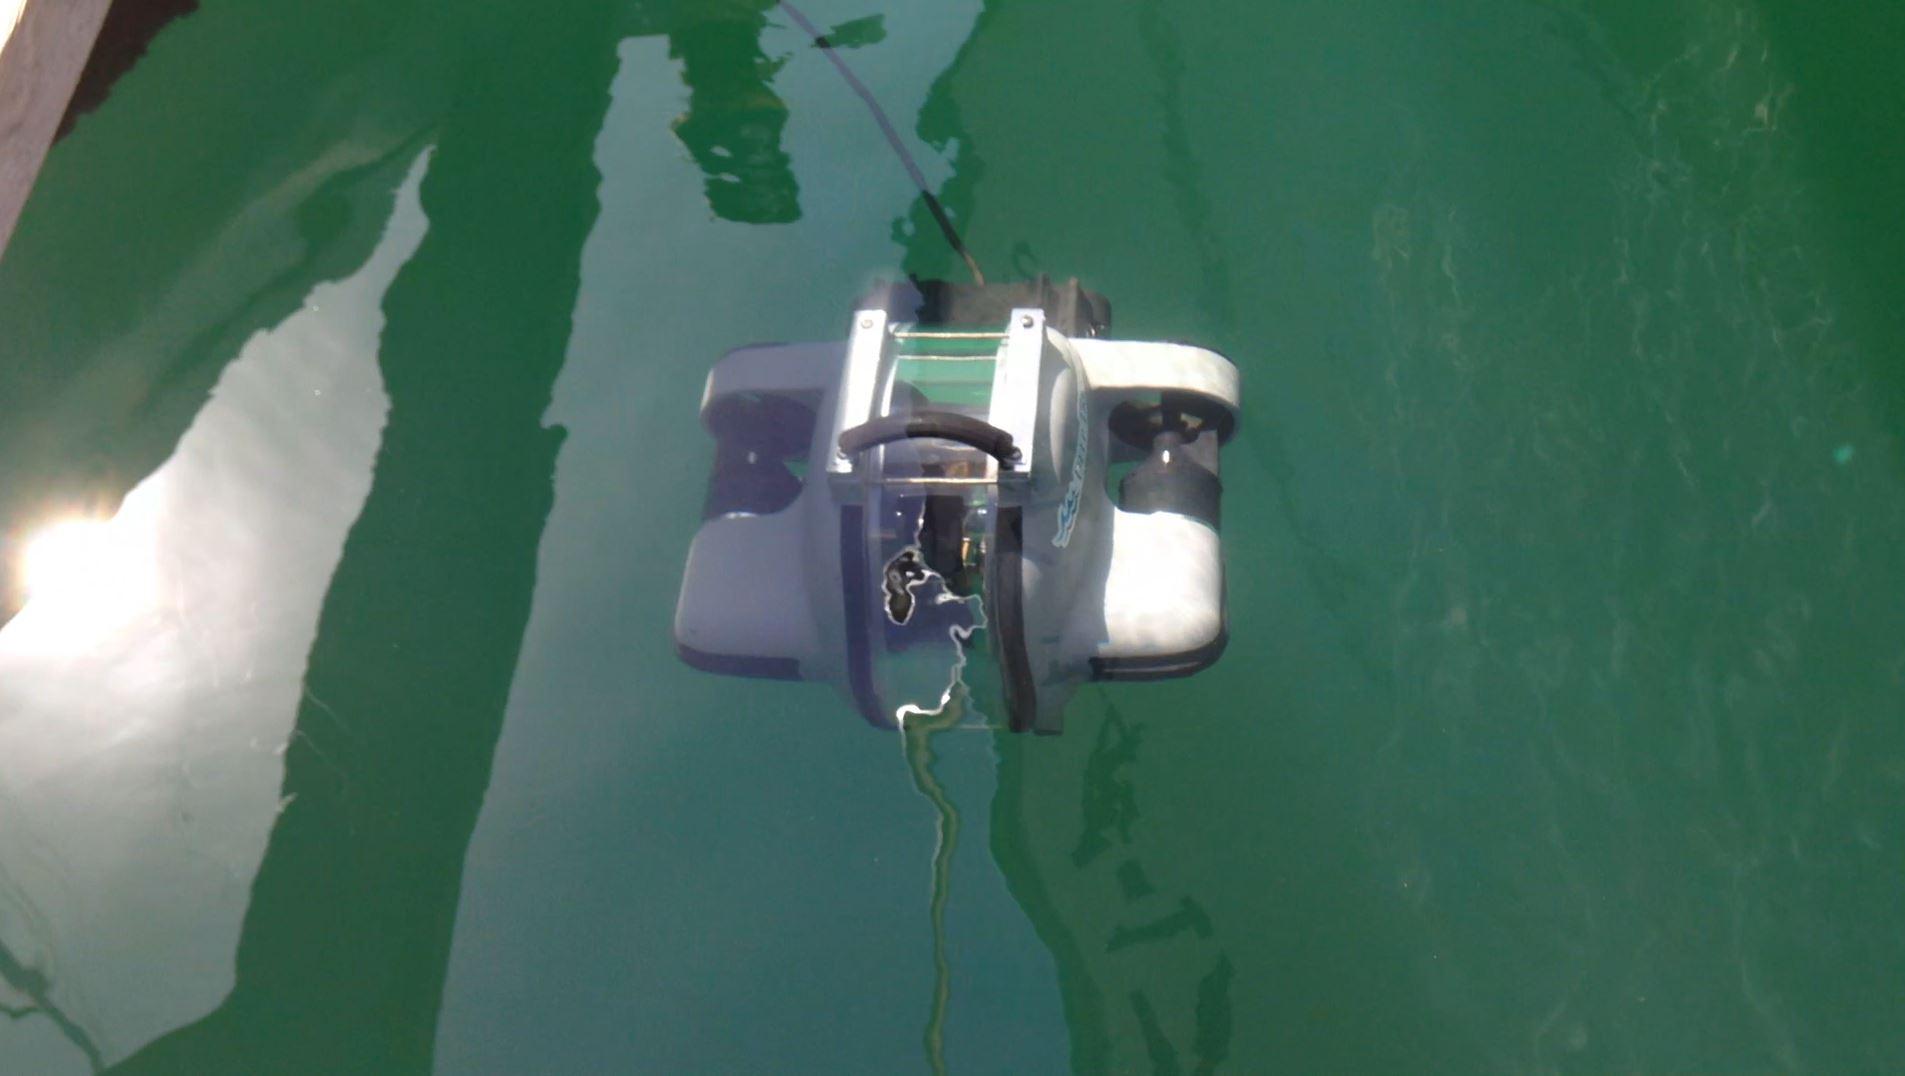 Underwater filming equipment